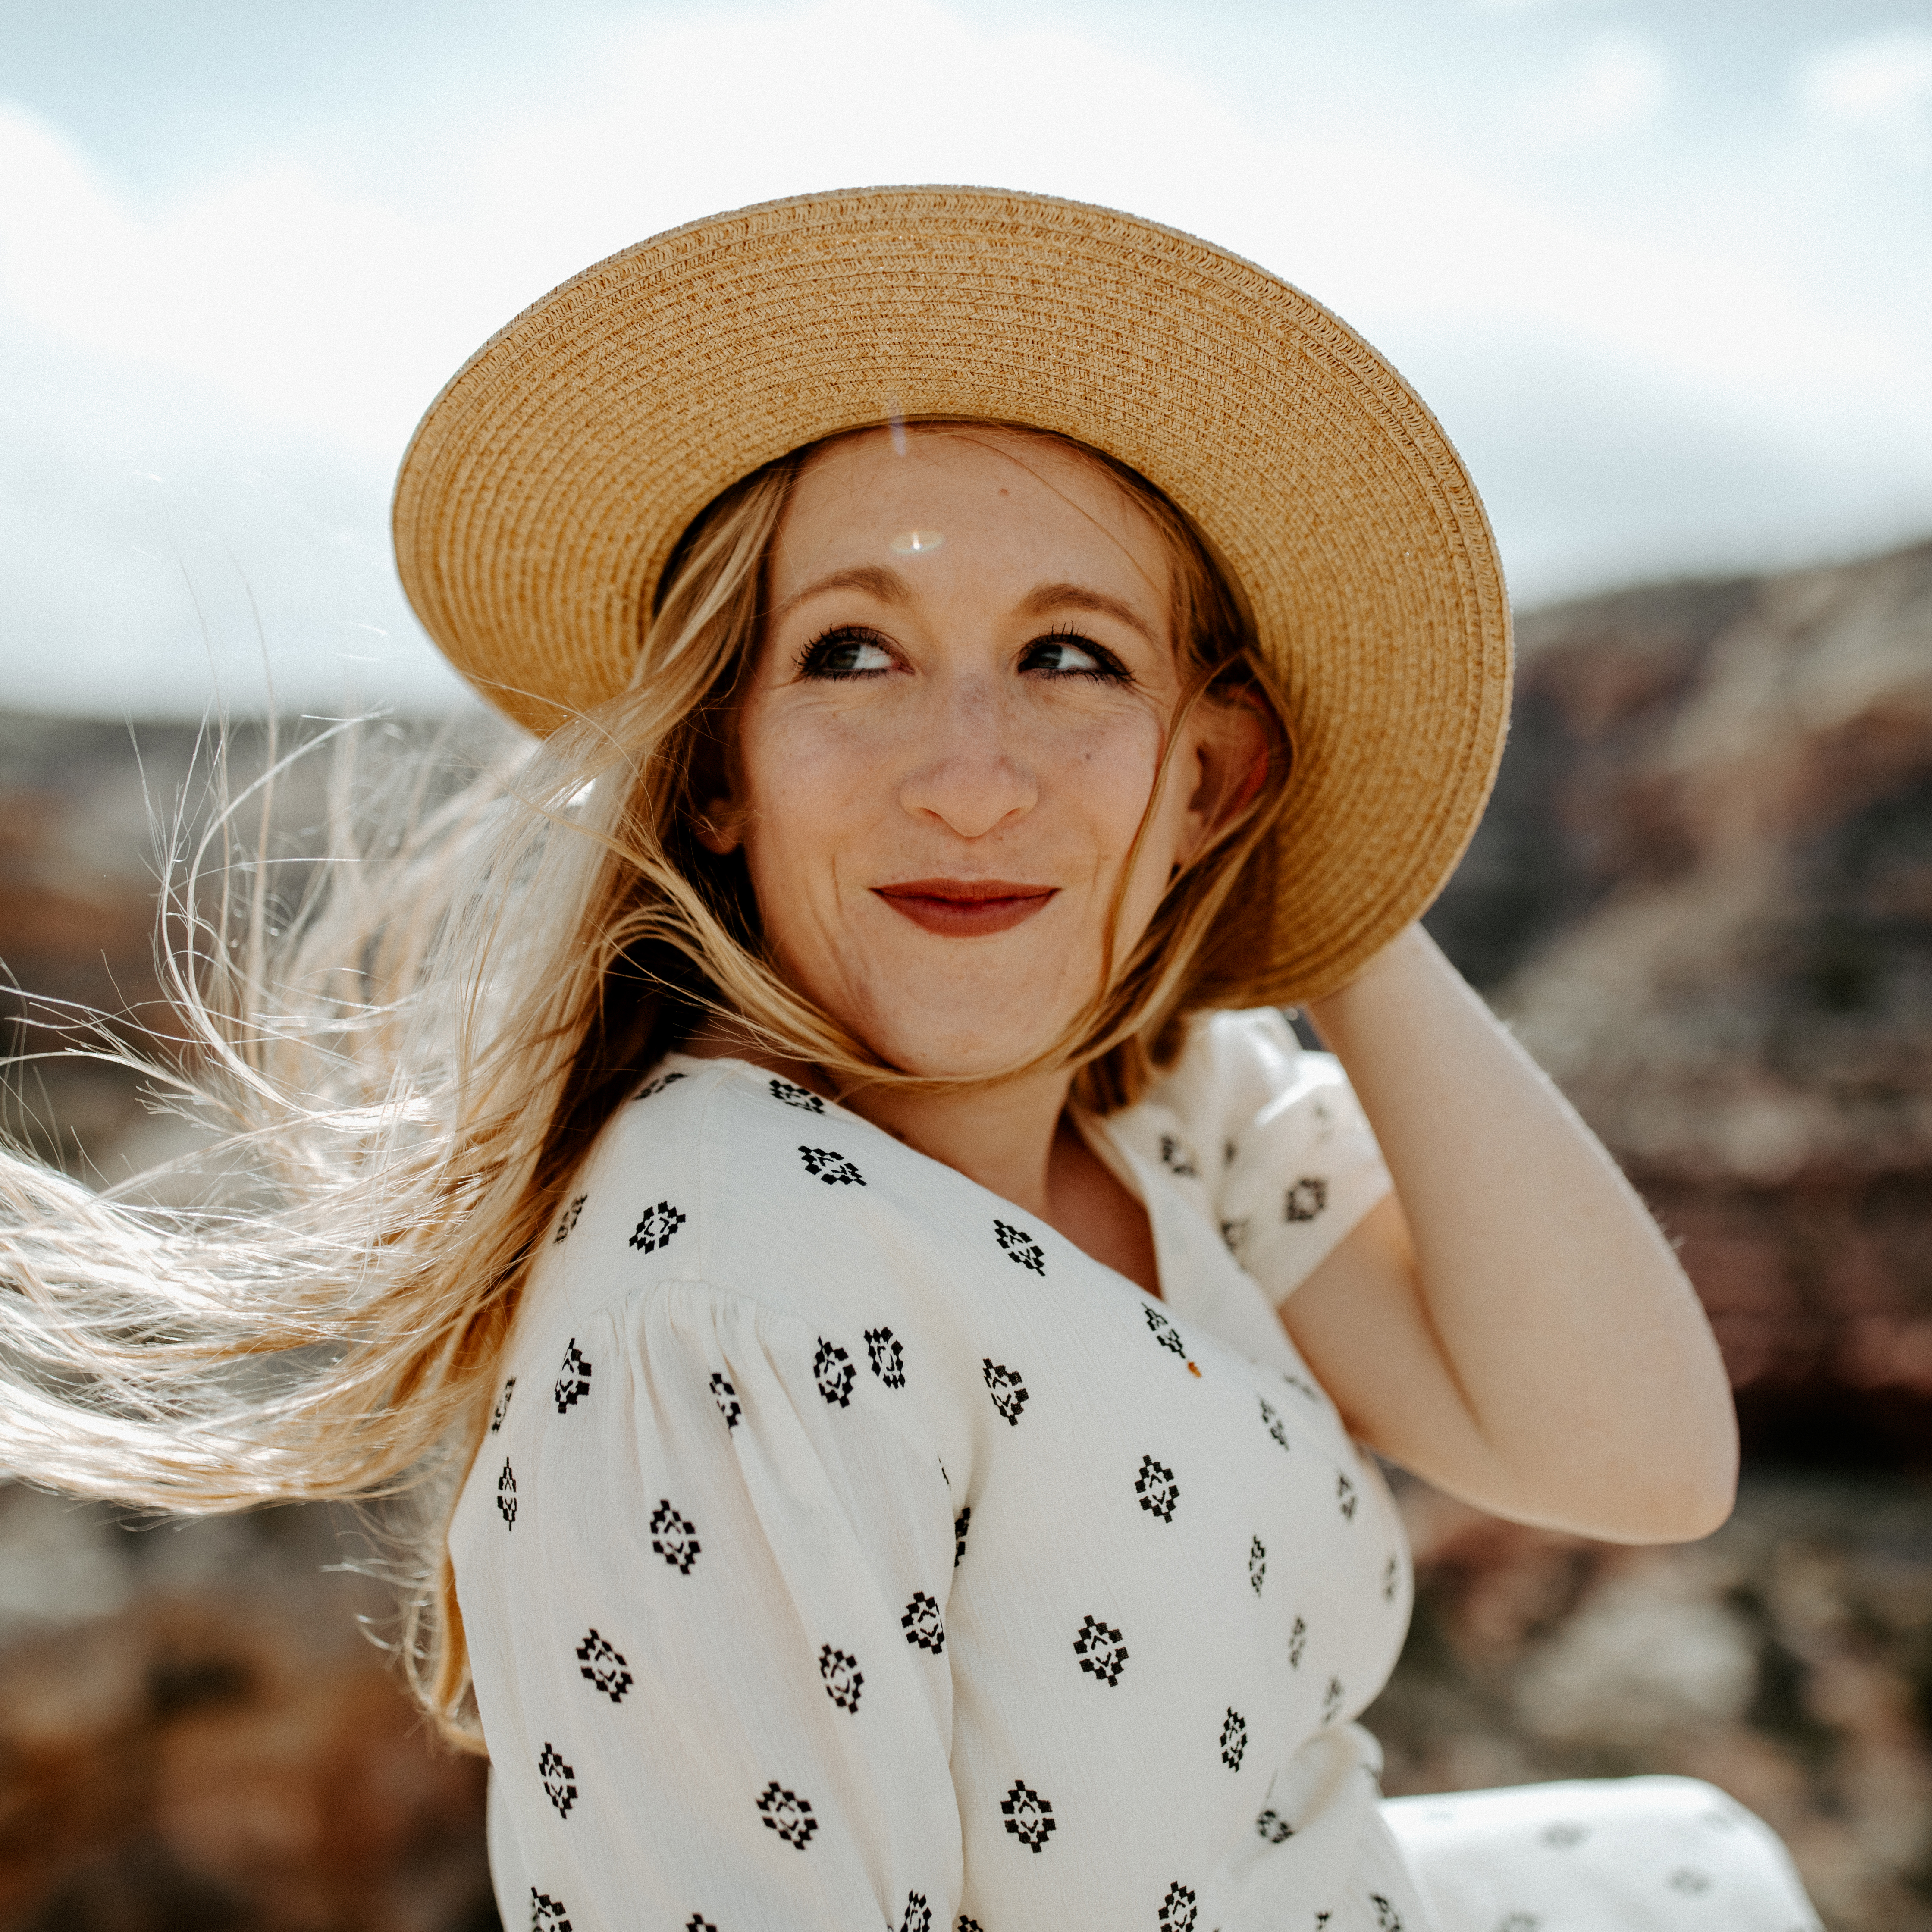 Printmaker Profile: Lindsay Roman